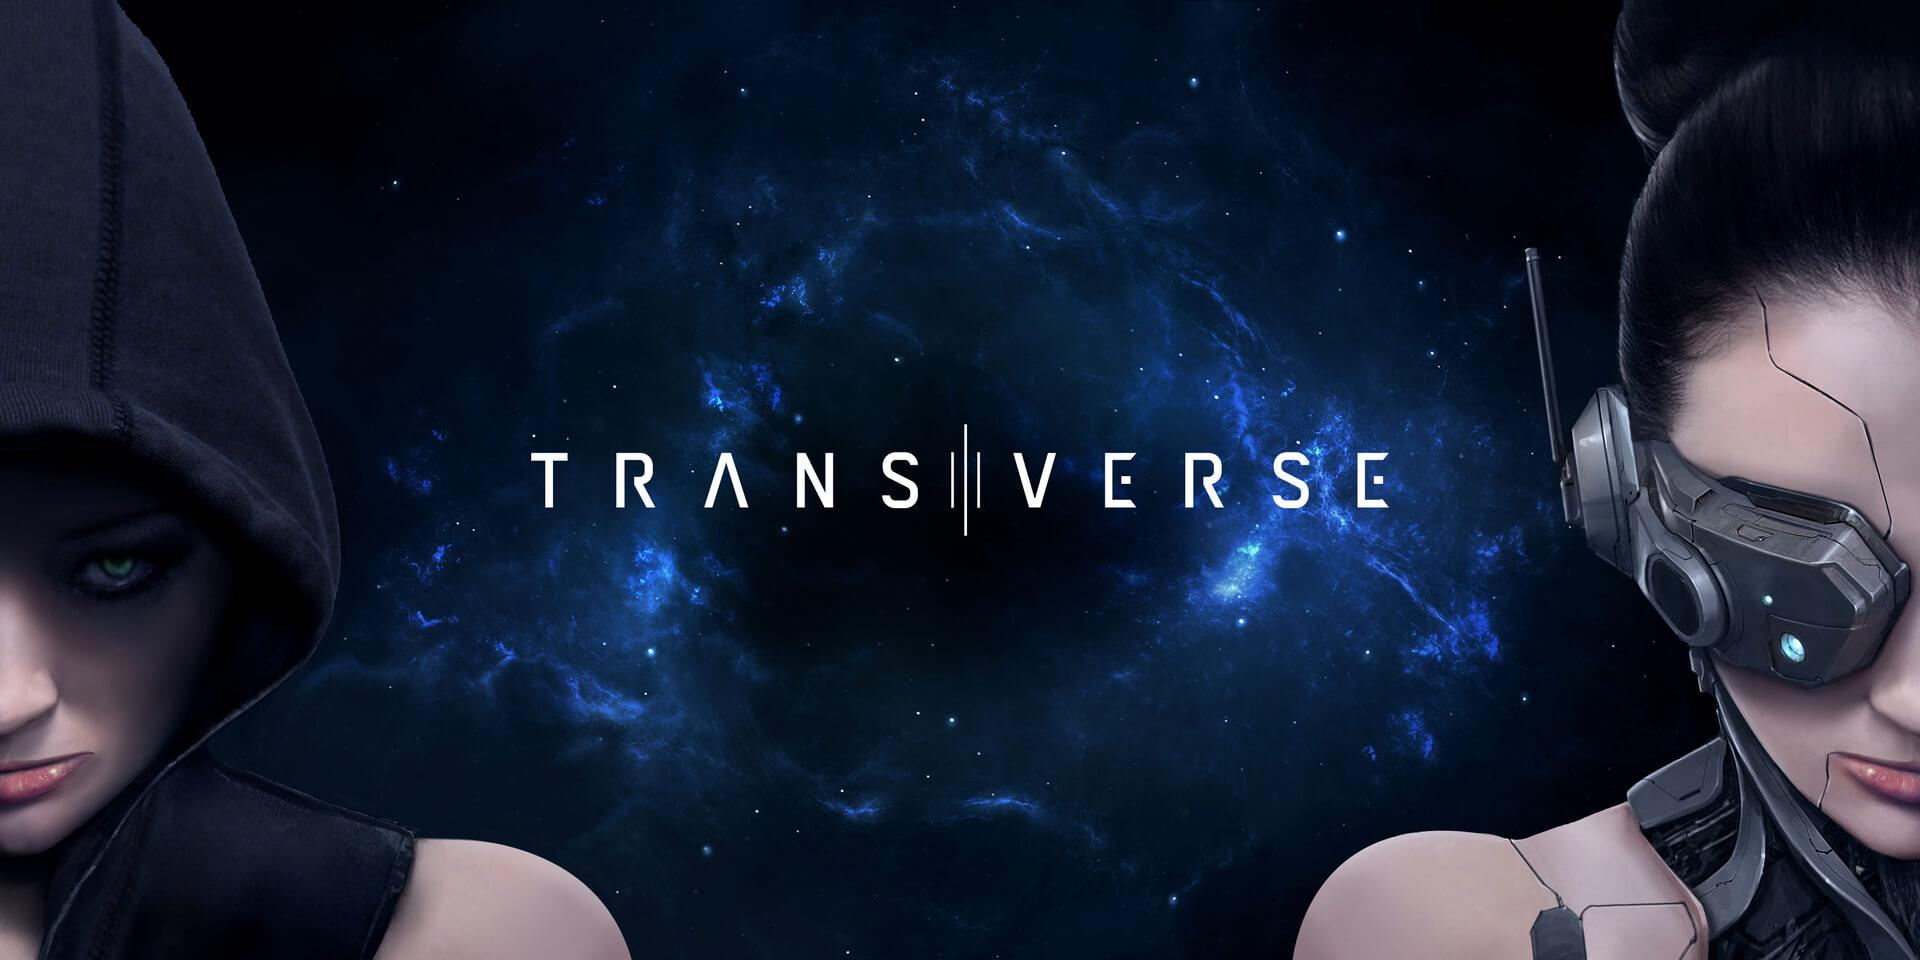 Transverse (Reveal Trailer)